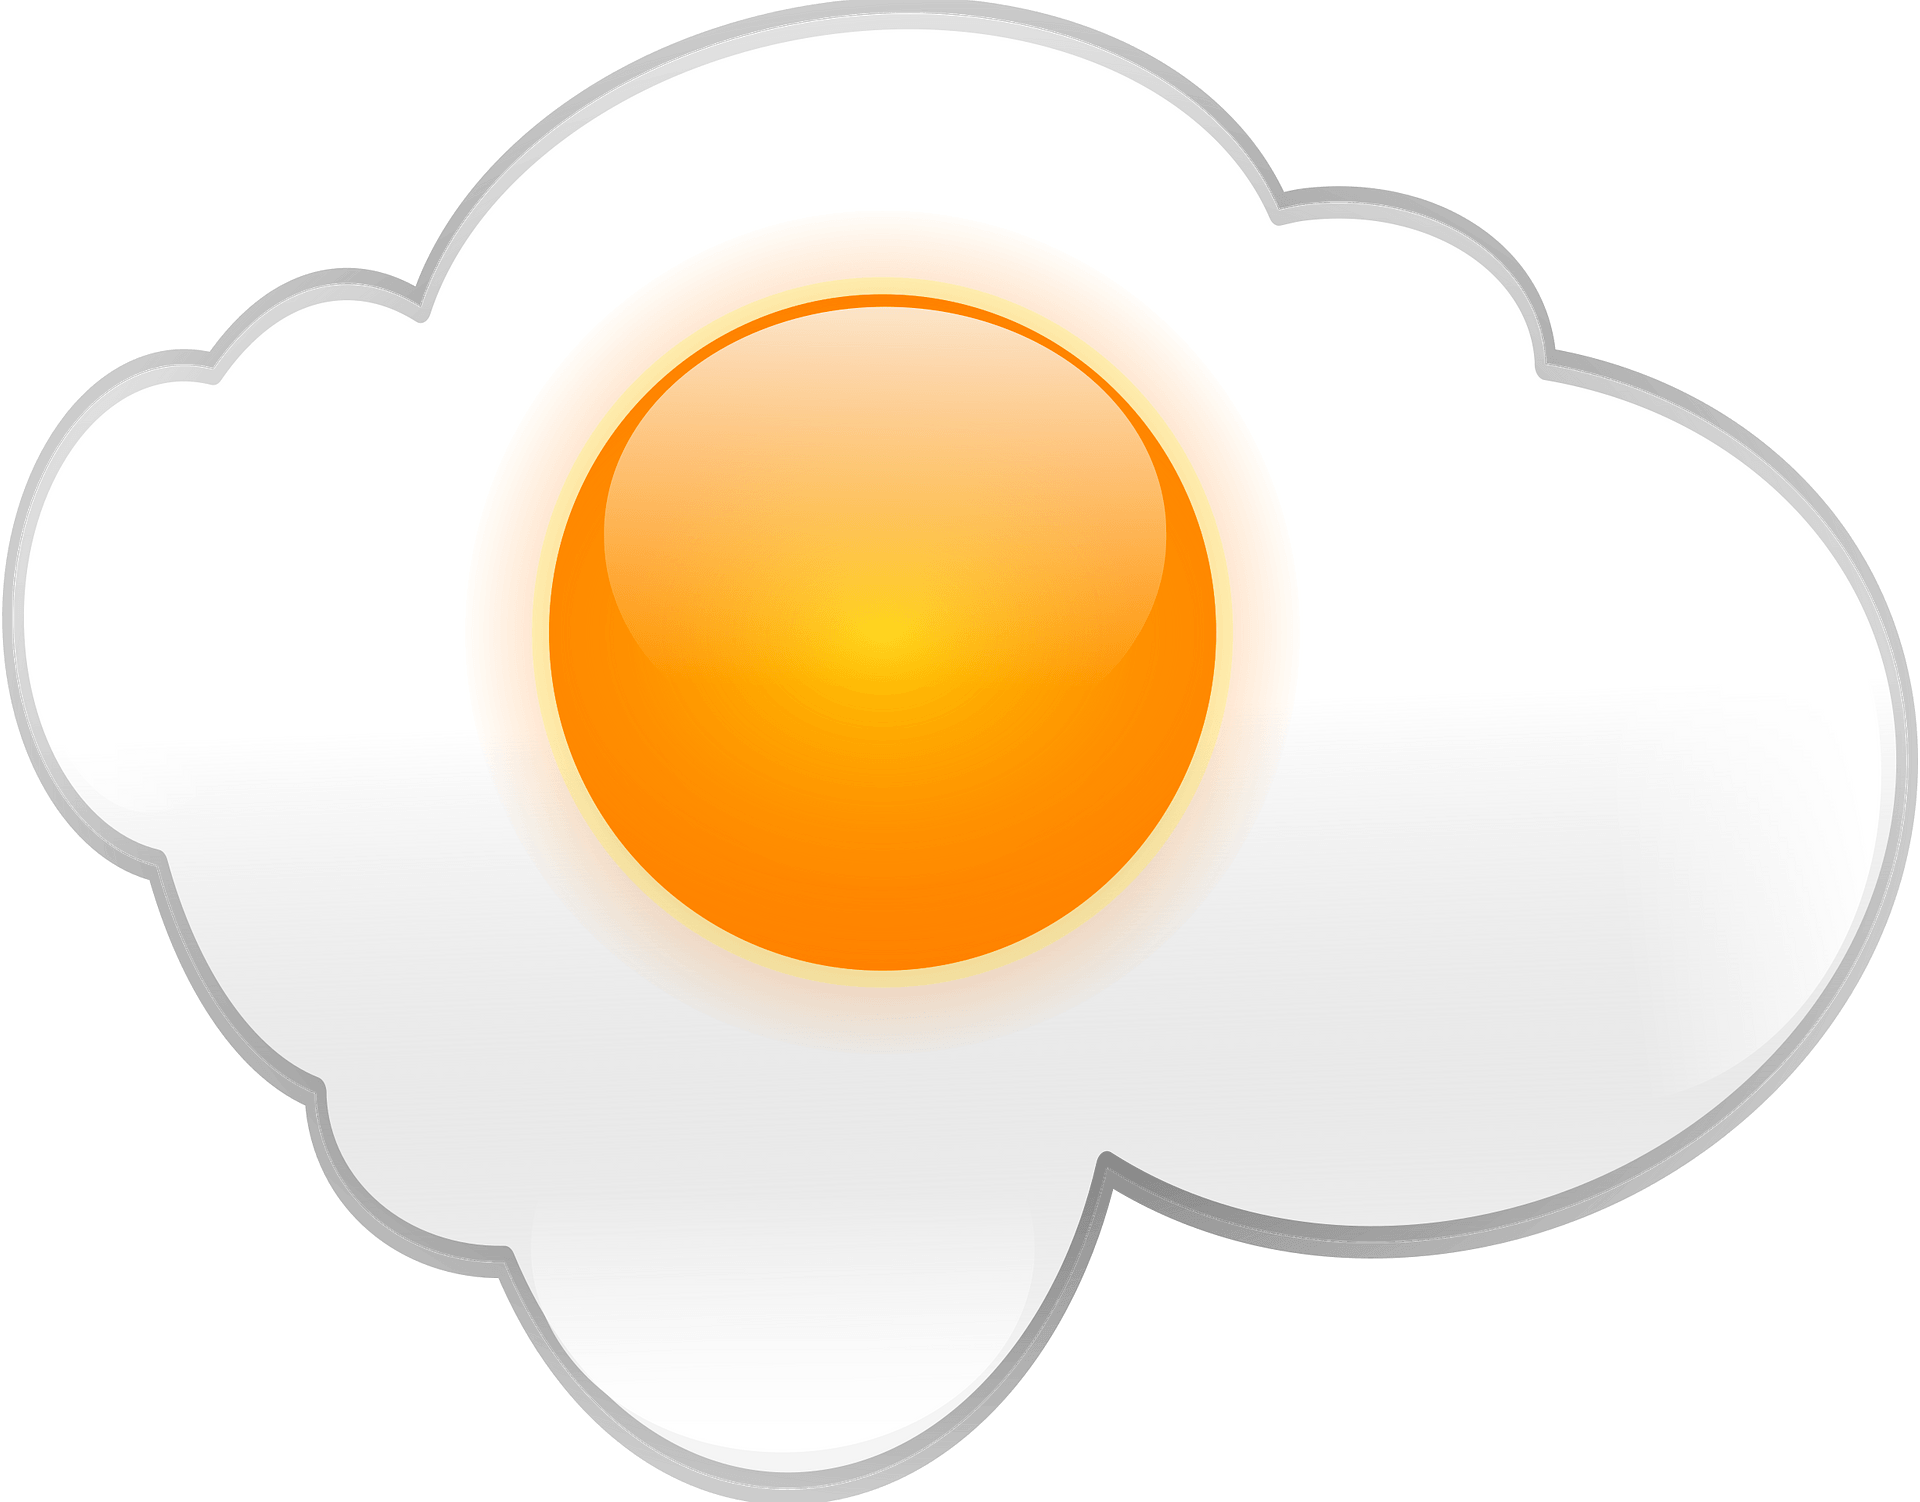 Free Fried Egg Clip Art - Fried Egg - 450x450 PNG Download - PNGkit